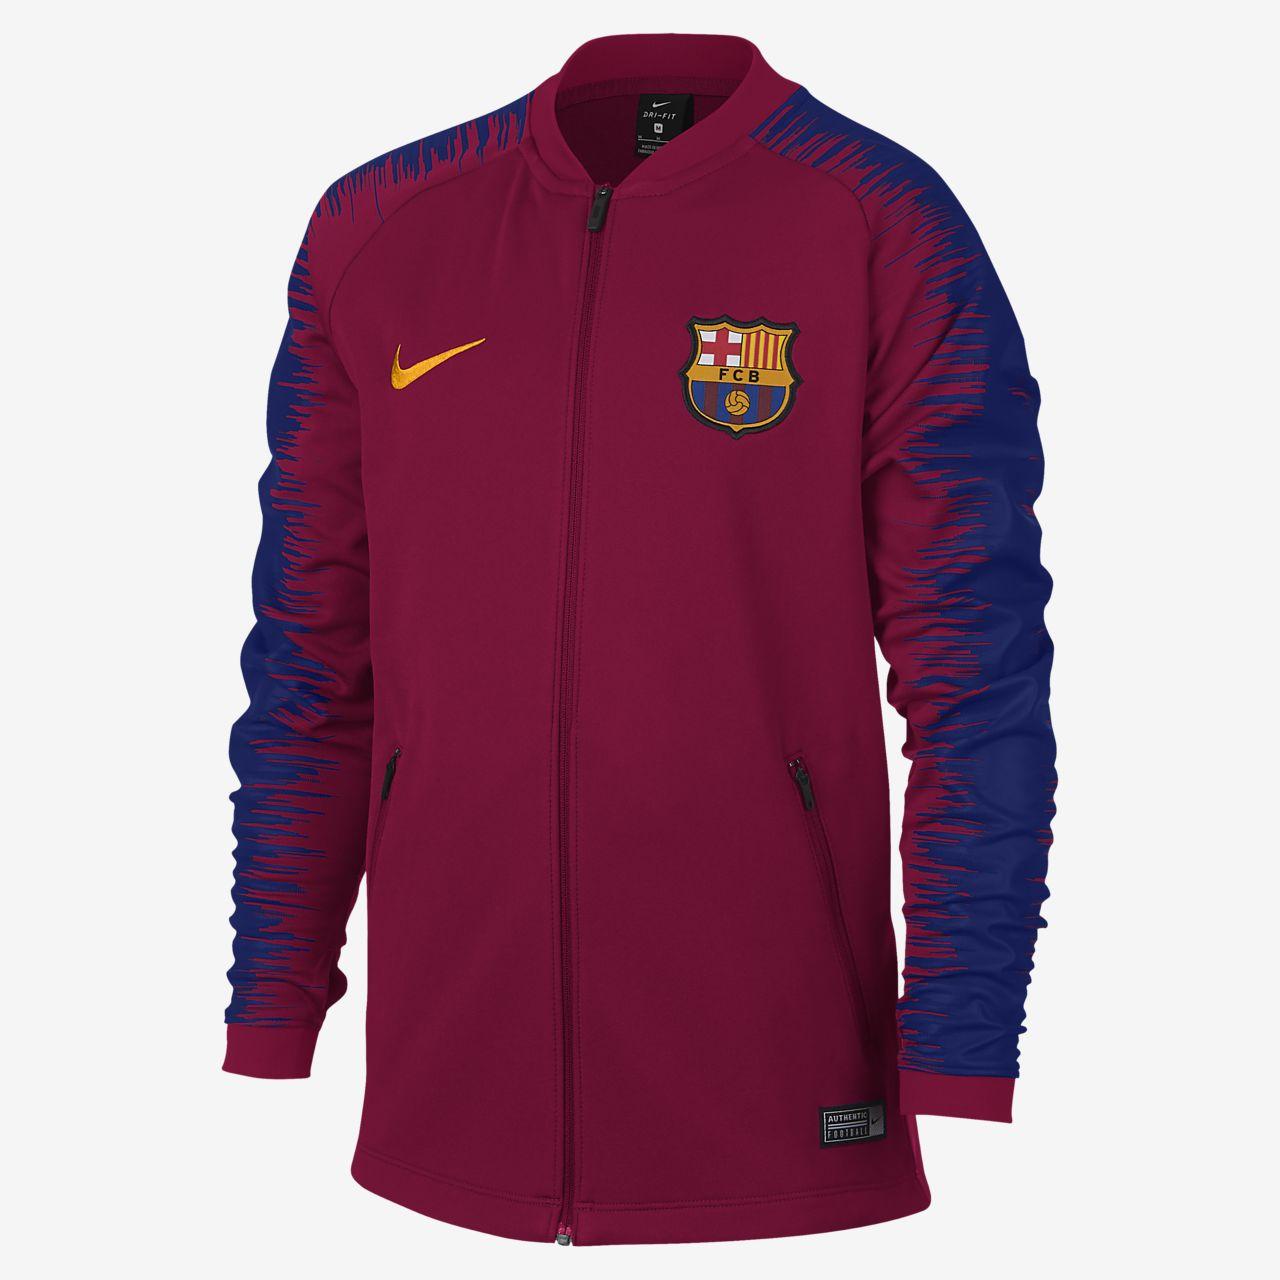 adad25e833b0 FC Barcelona Anthem Older Kids  Football Jacket. Nike.com GB